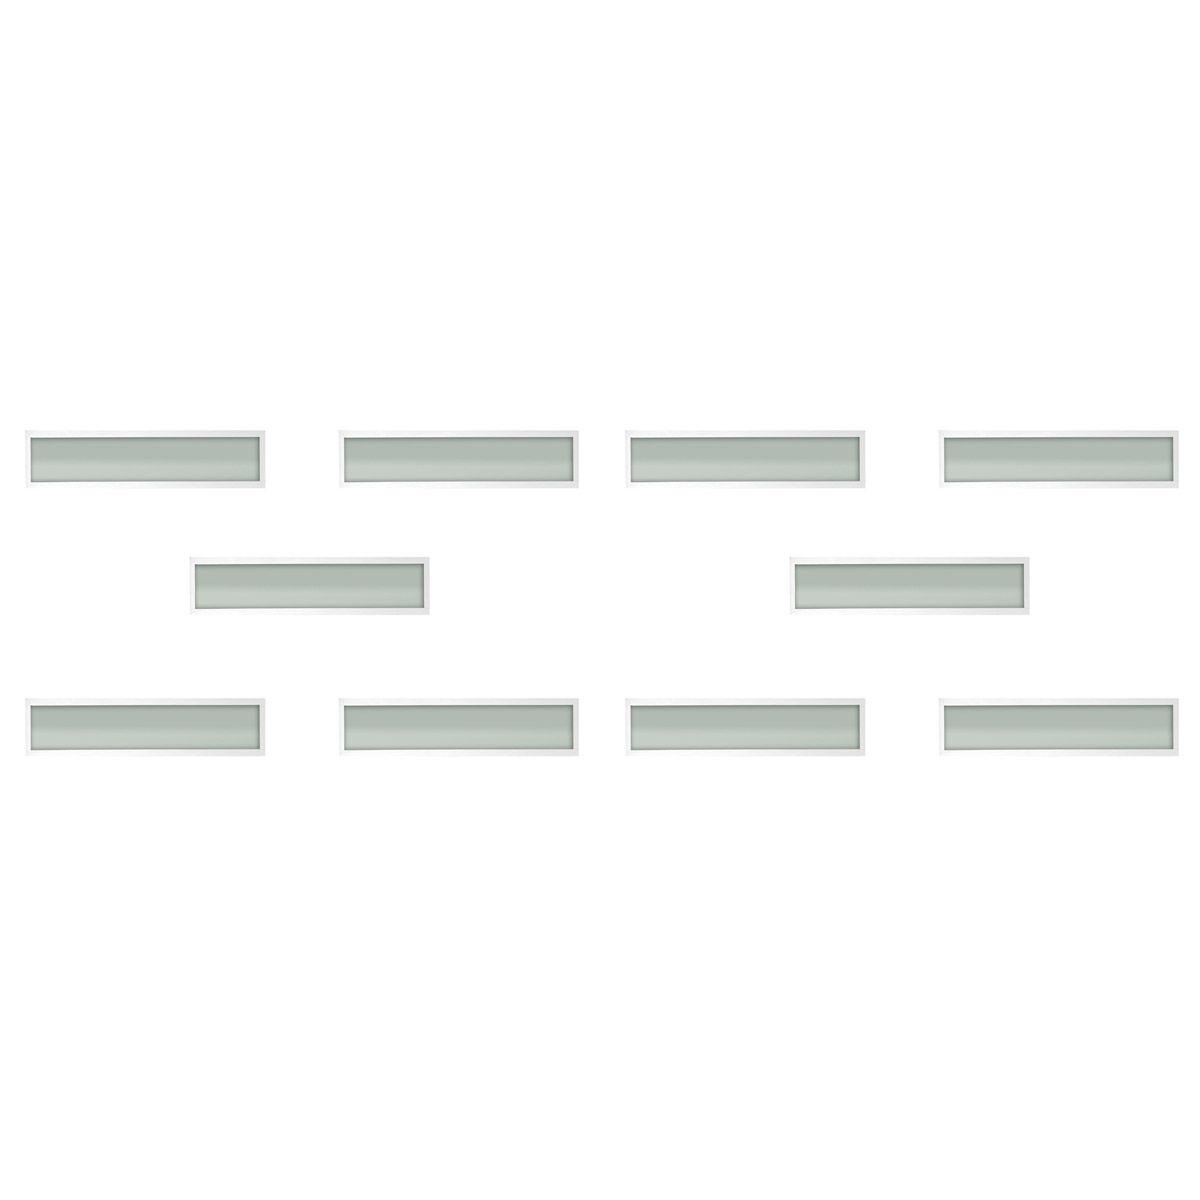 Plafon Space Sobr. Ret. 75cm Alum. Vidro Fosco 2x20w Fluor. Branco 10 Unidades